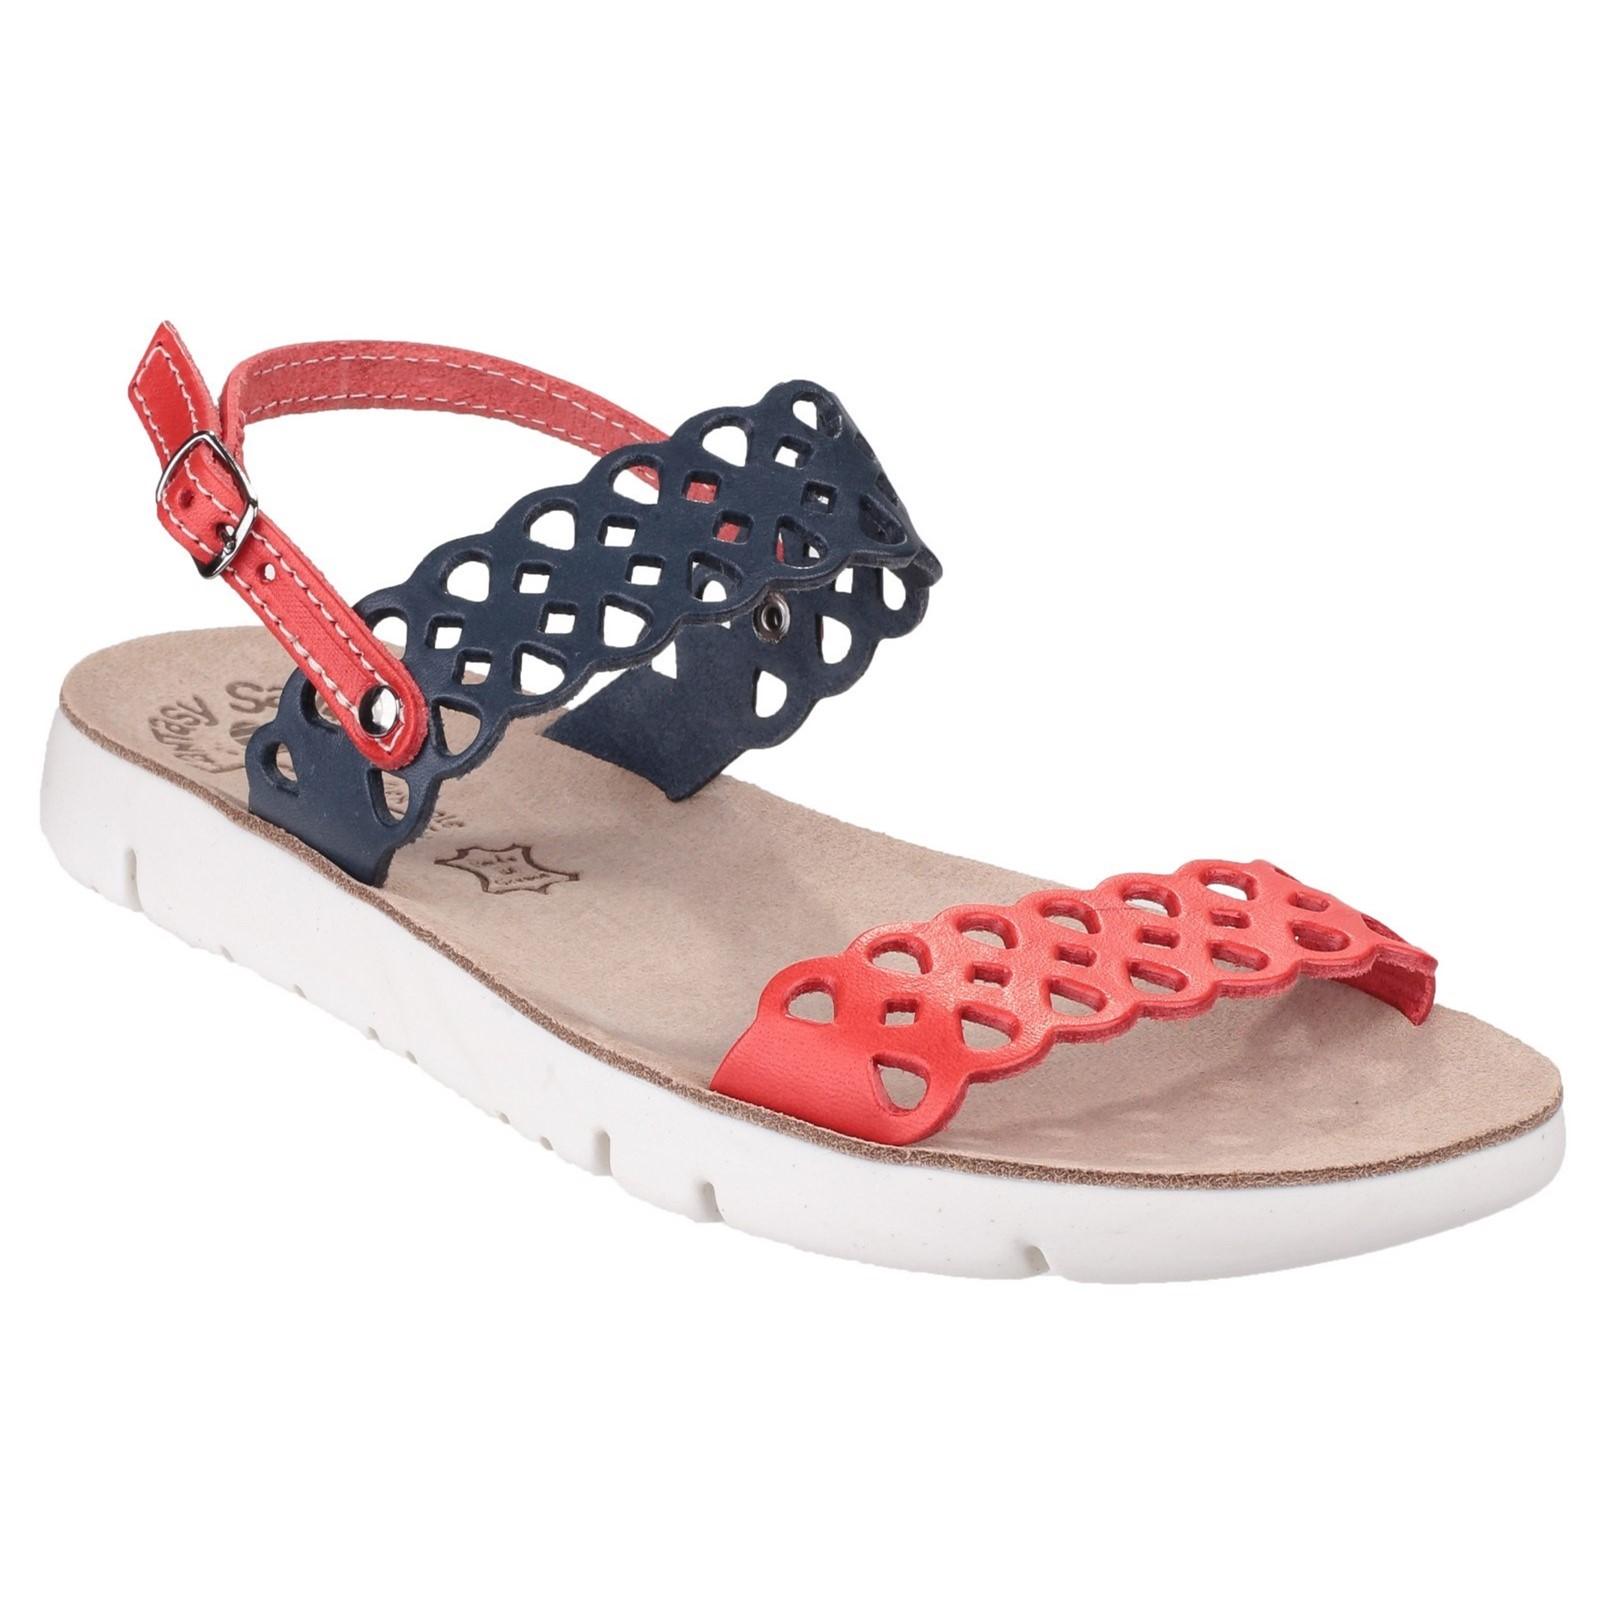 Fantasy Womens Piperi Ladies Summer Sandal Red bluee Size UK 4 EU 37